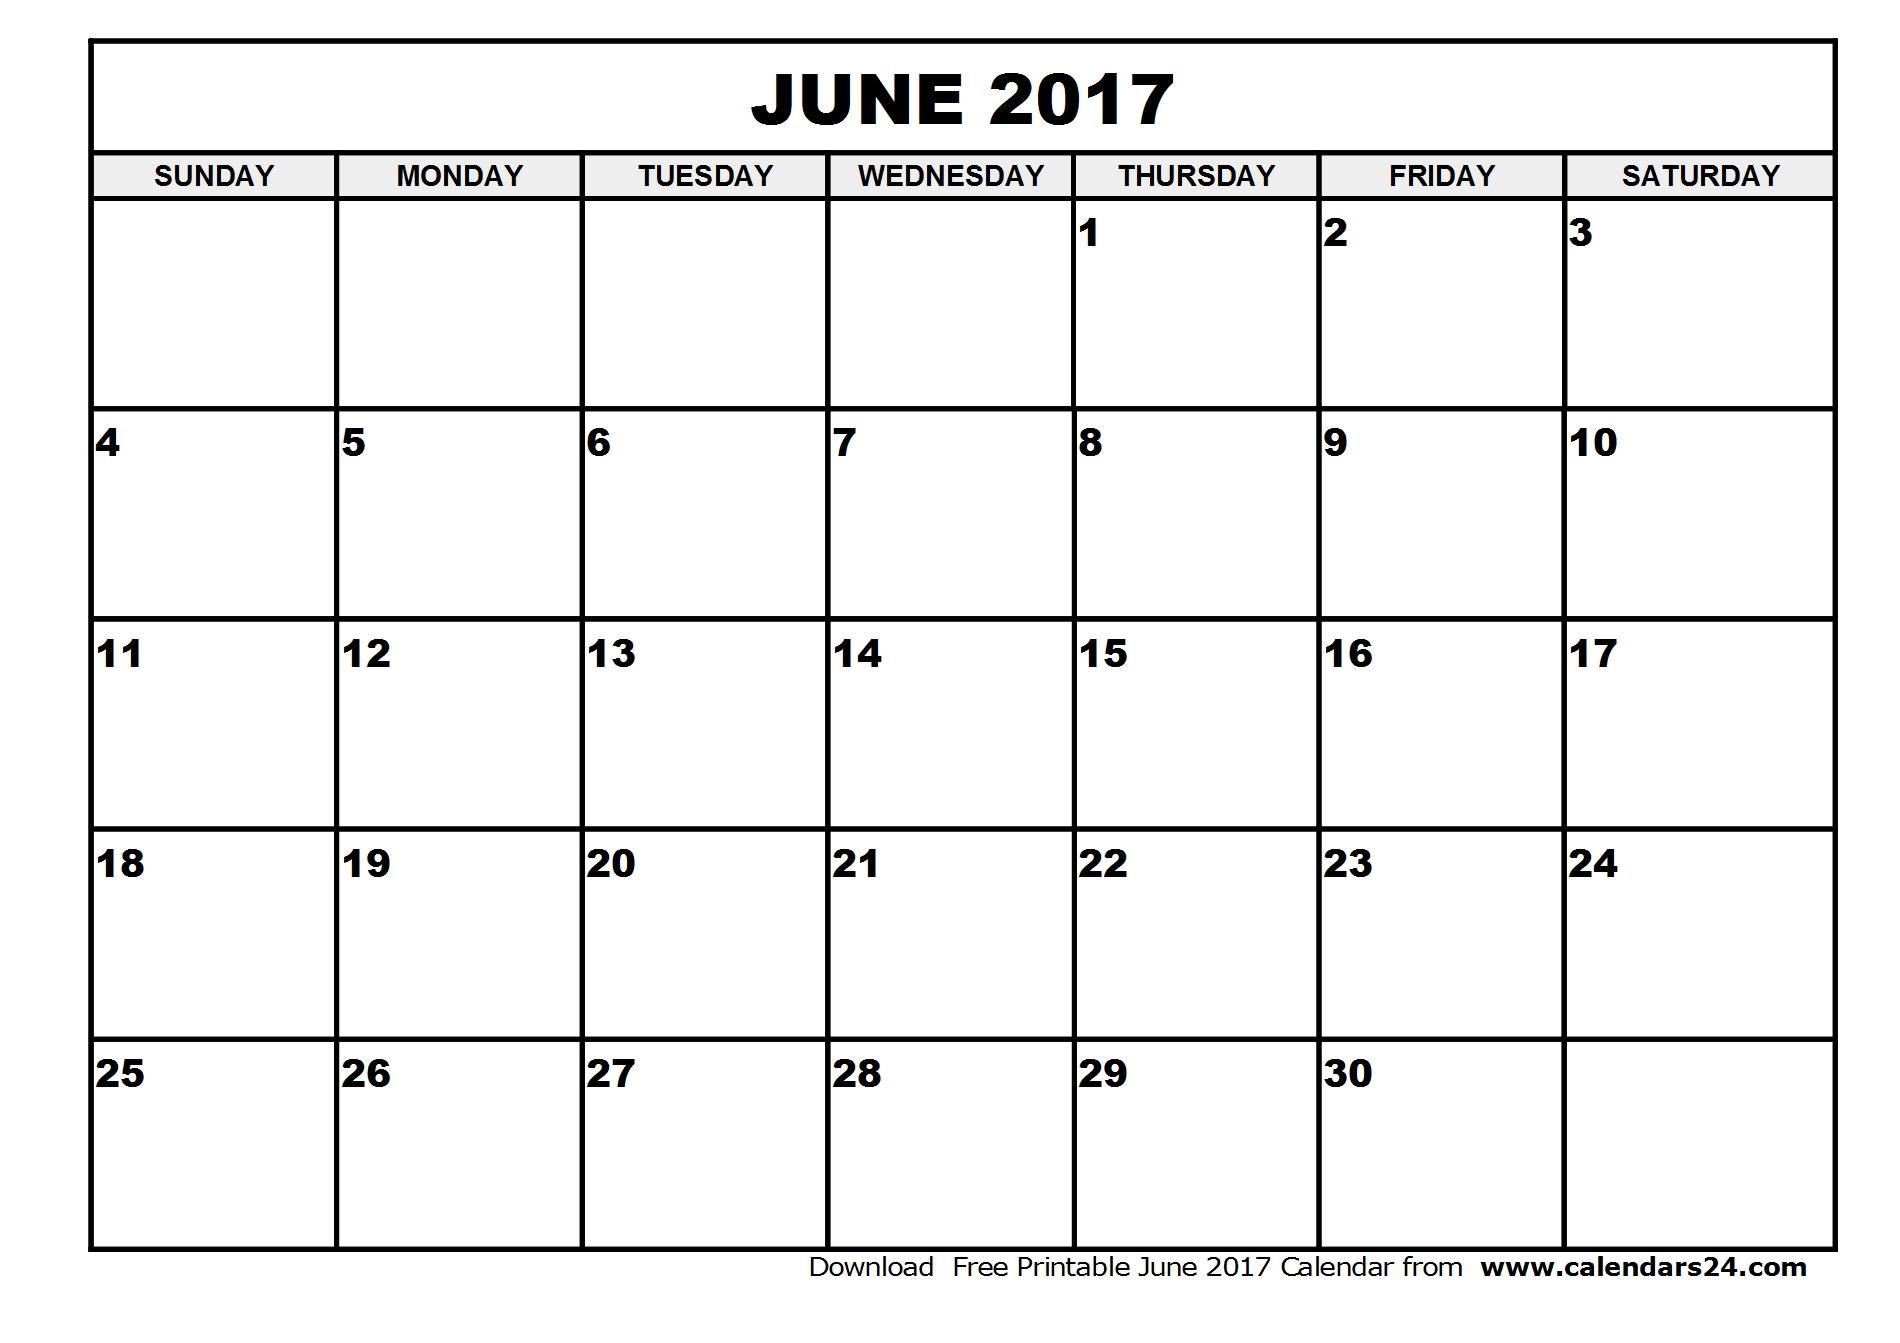 Calendar June And July 2017 - Bgadv for June And July Blank Calendar